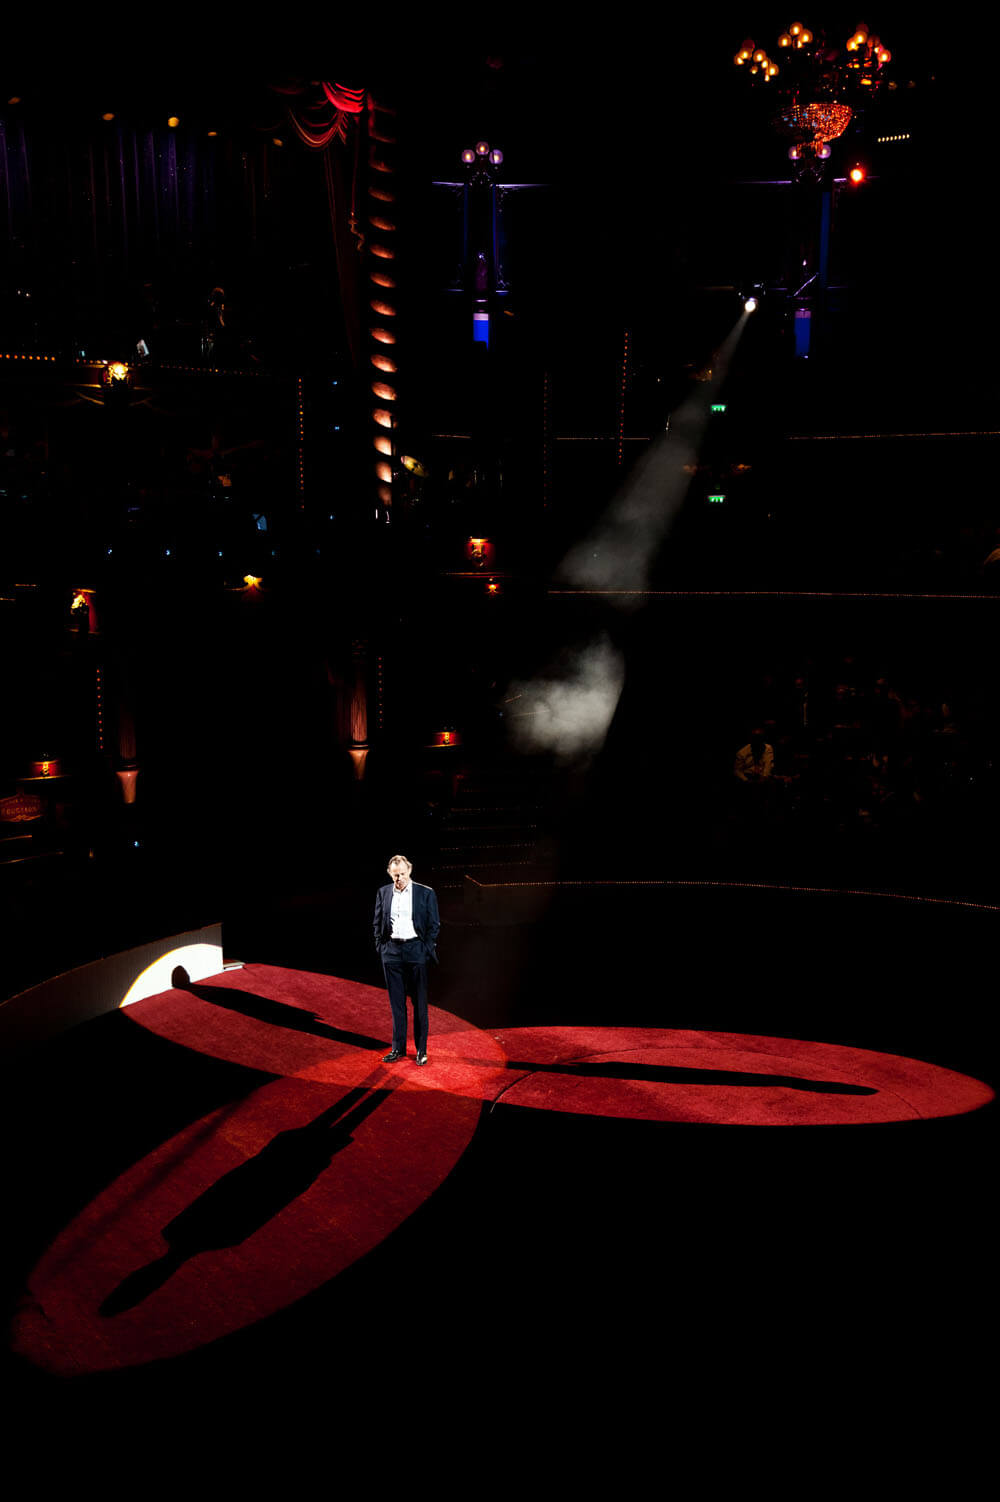 Michel Leeb pour le Gala de l'Union, Cirque Bouglione